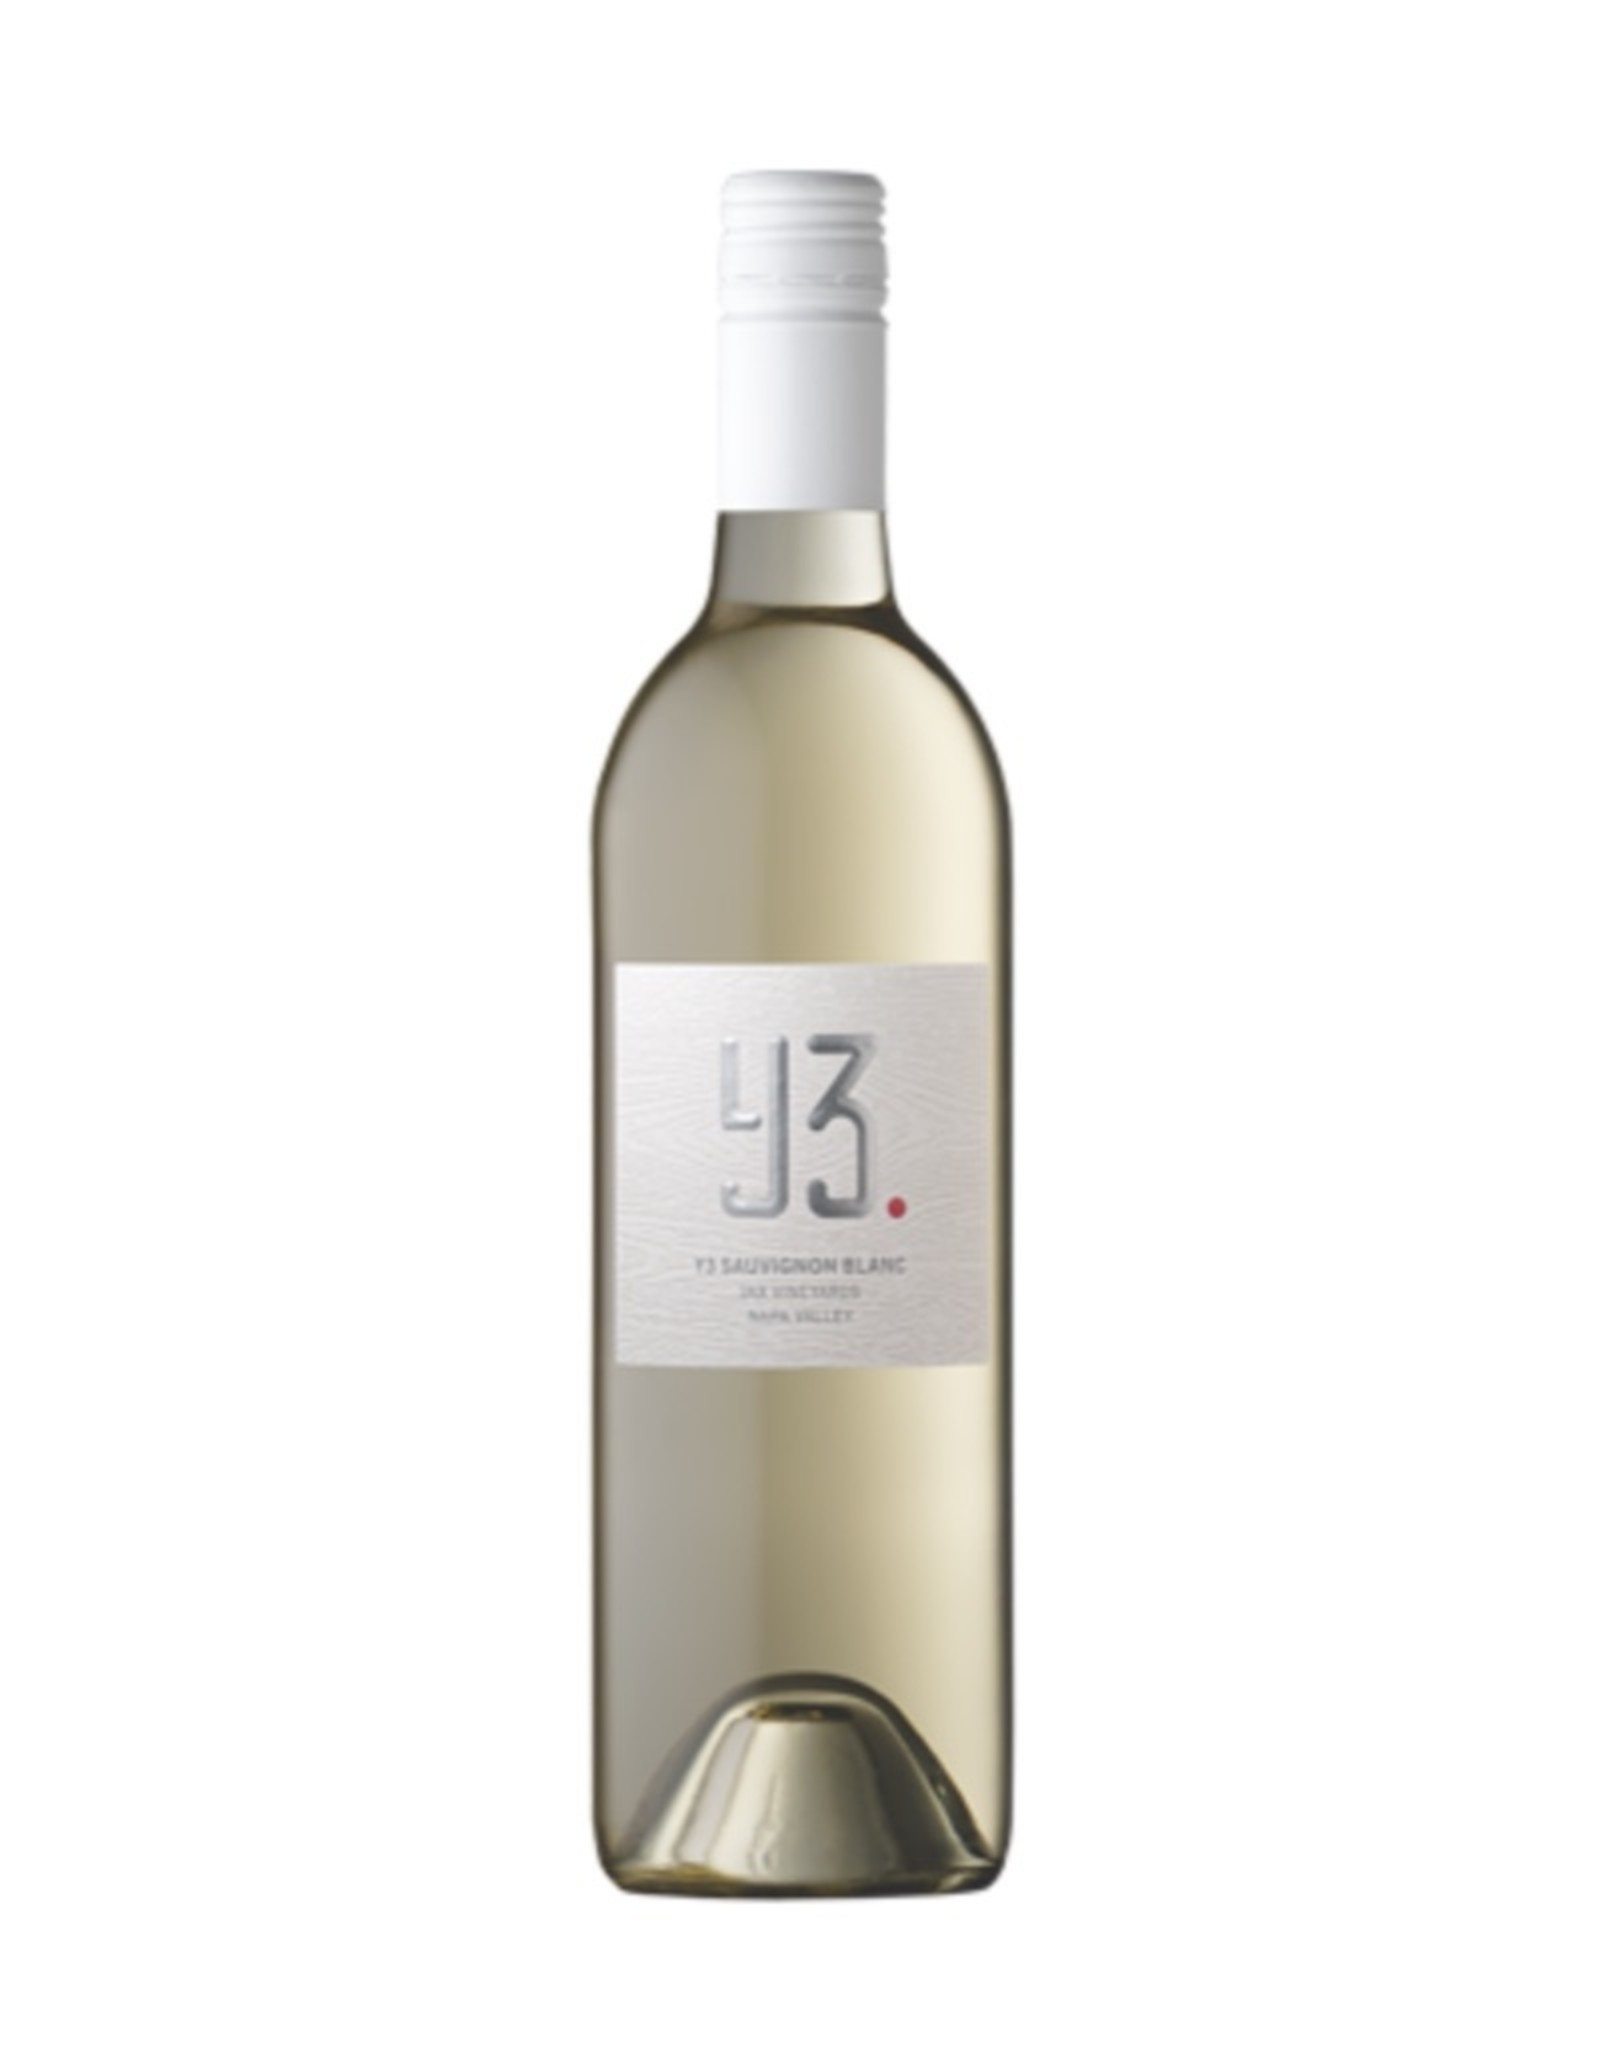 JAX Y3 Napa Sauvignon Blanc 2019